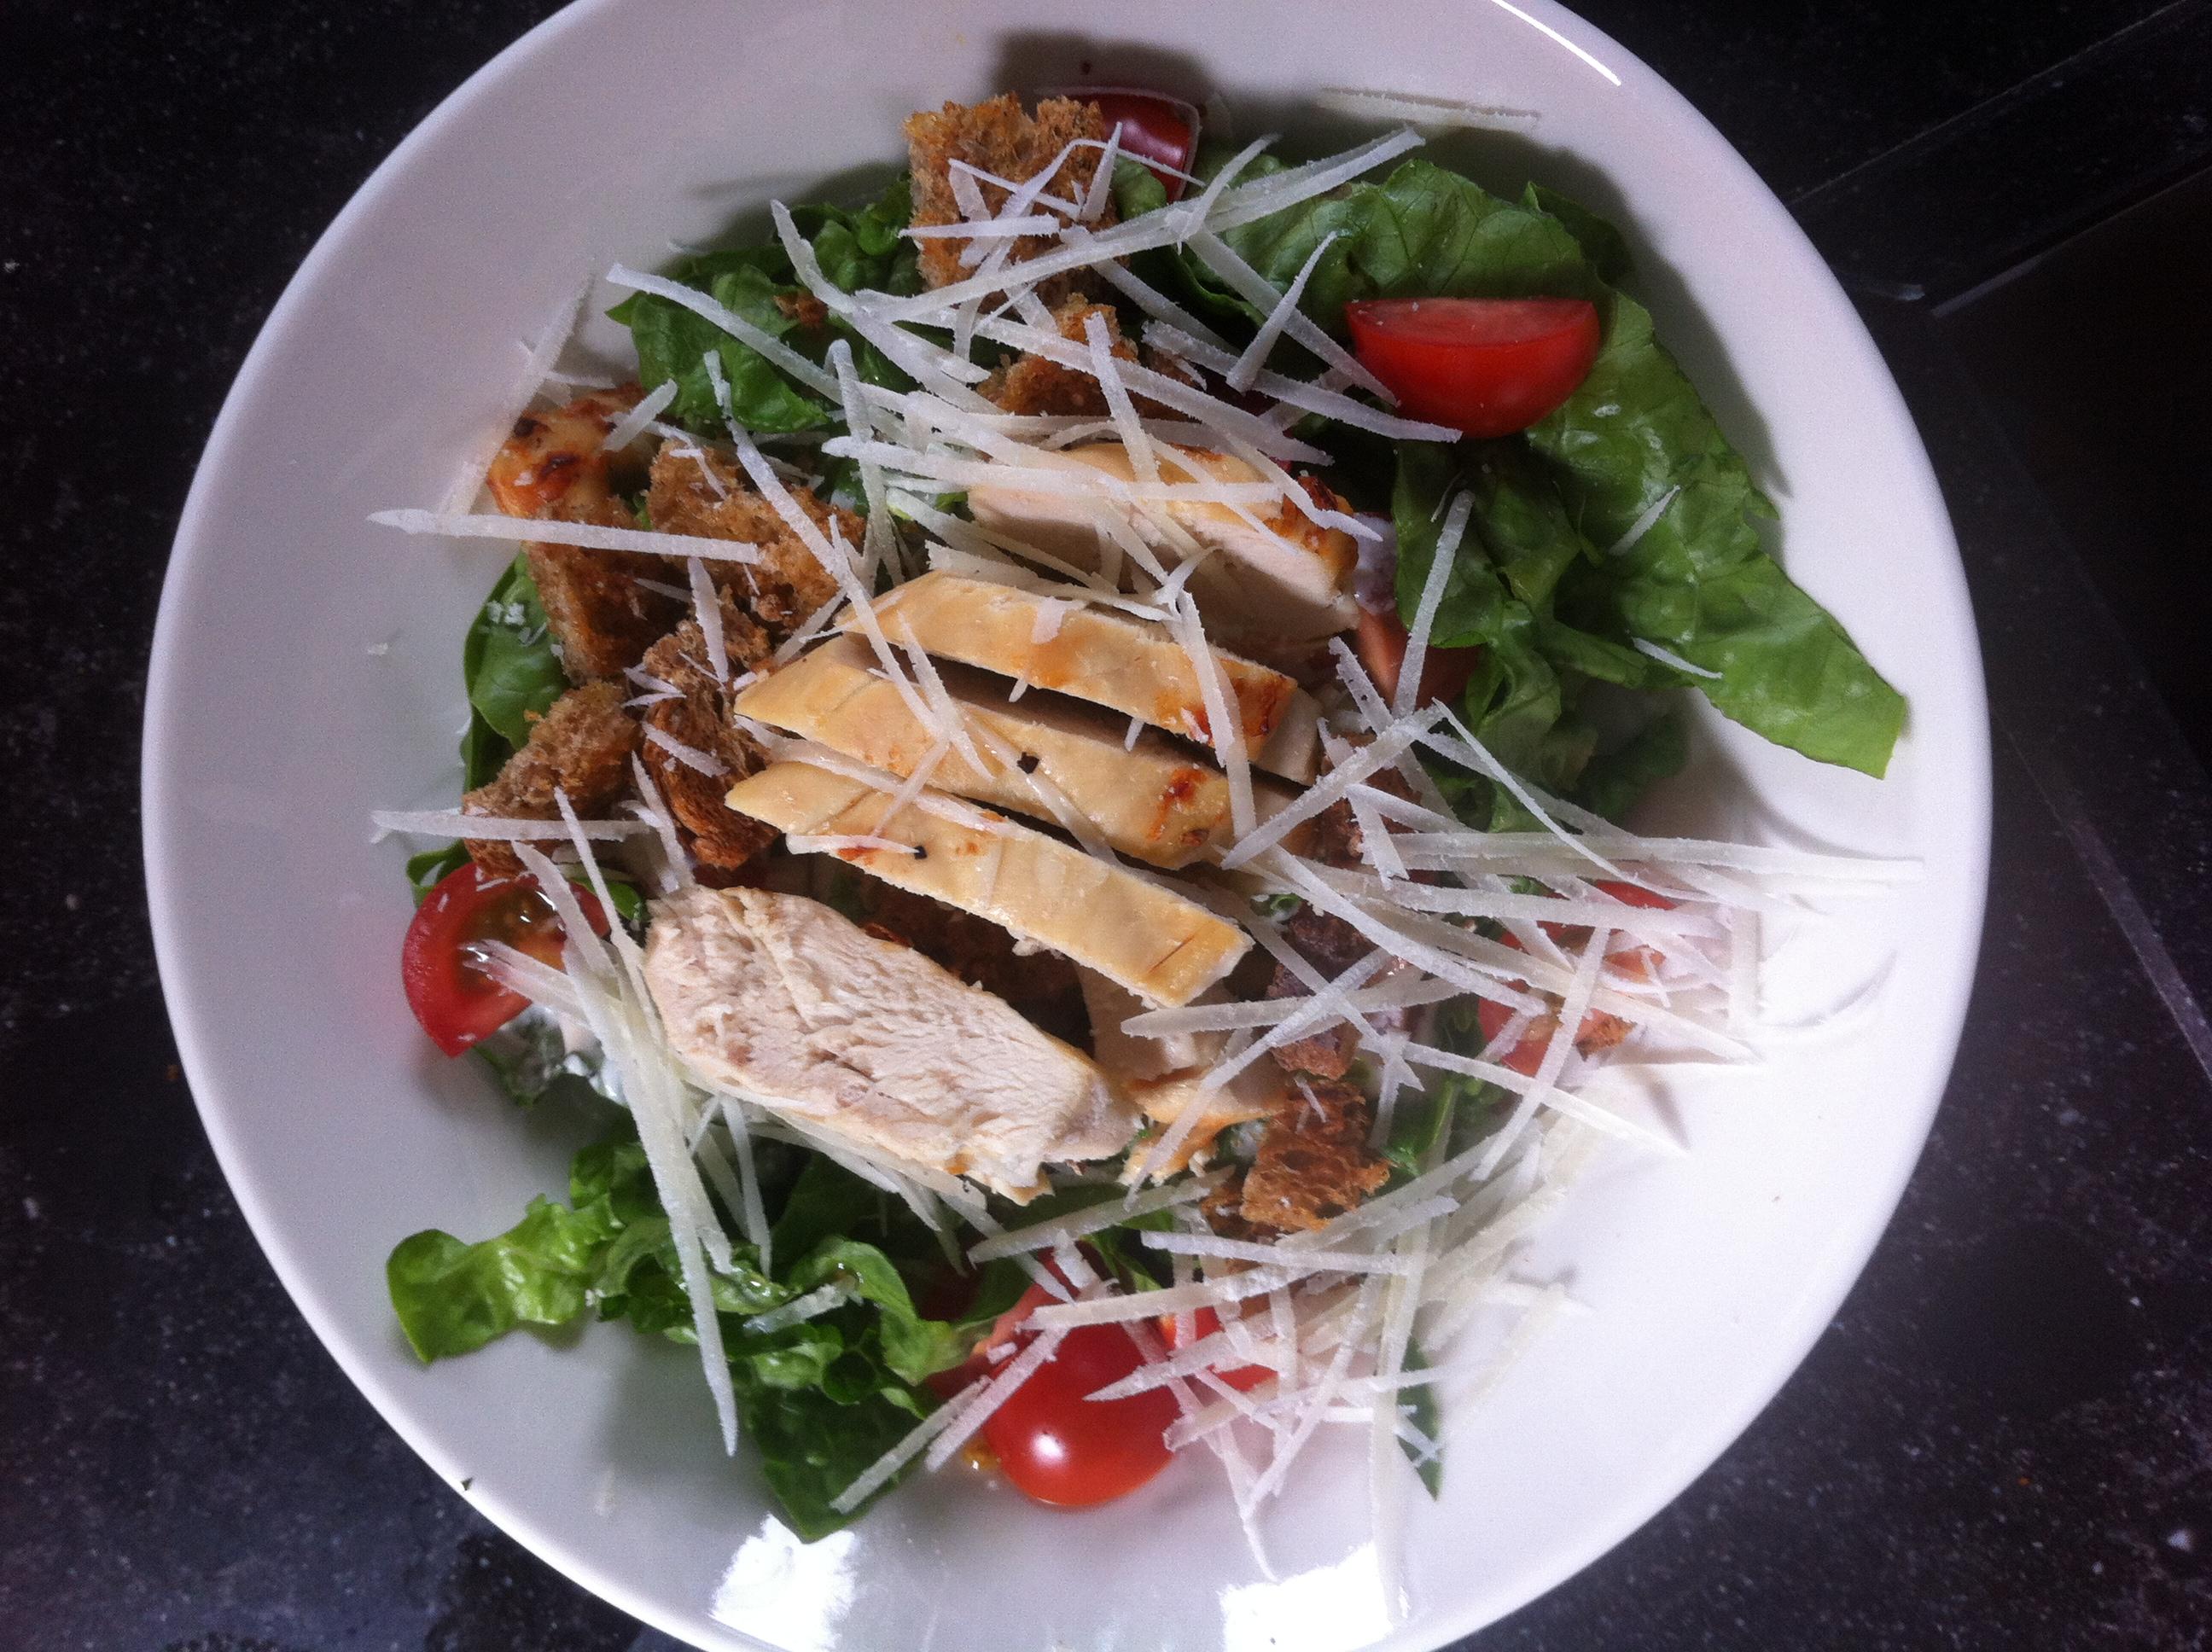 Ceasar salade met karnemelk kip | more #recepies at www.notafraidofbutter.nl